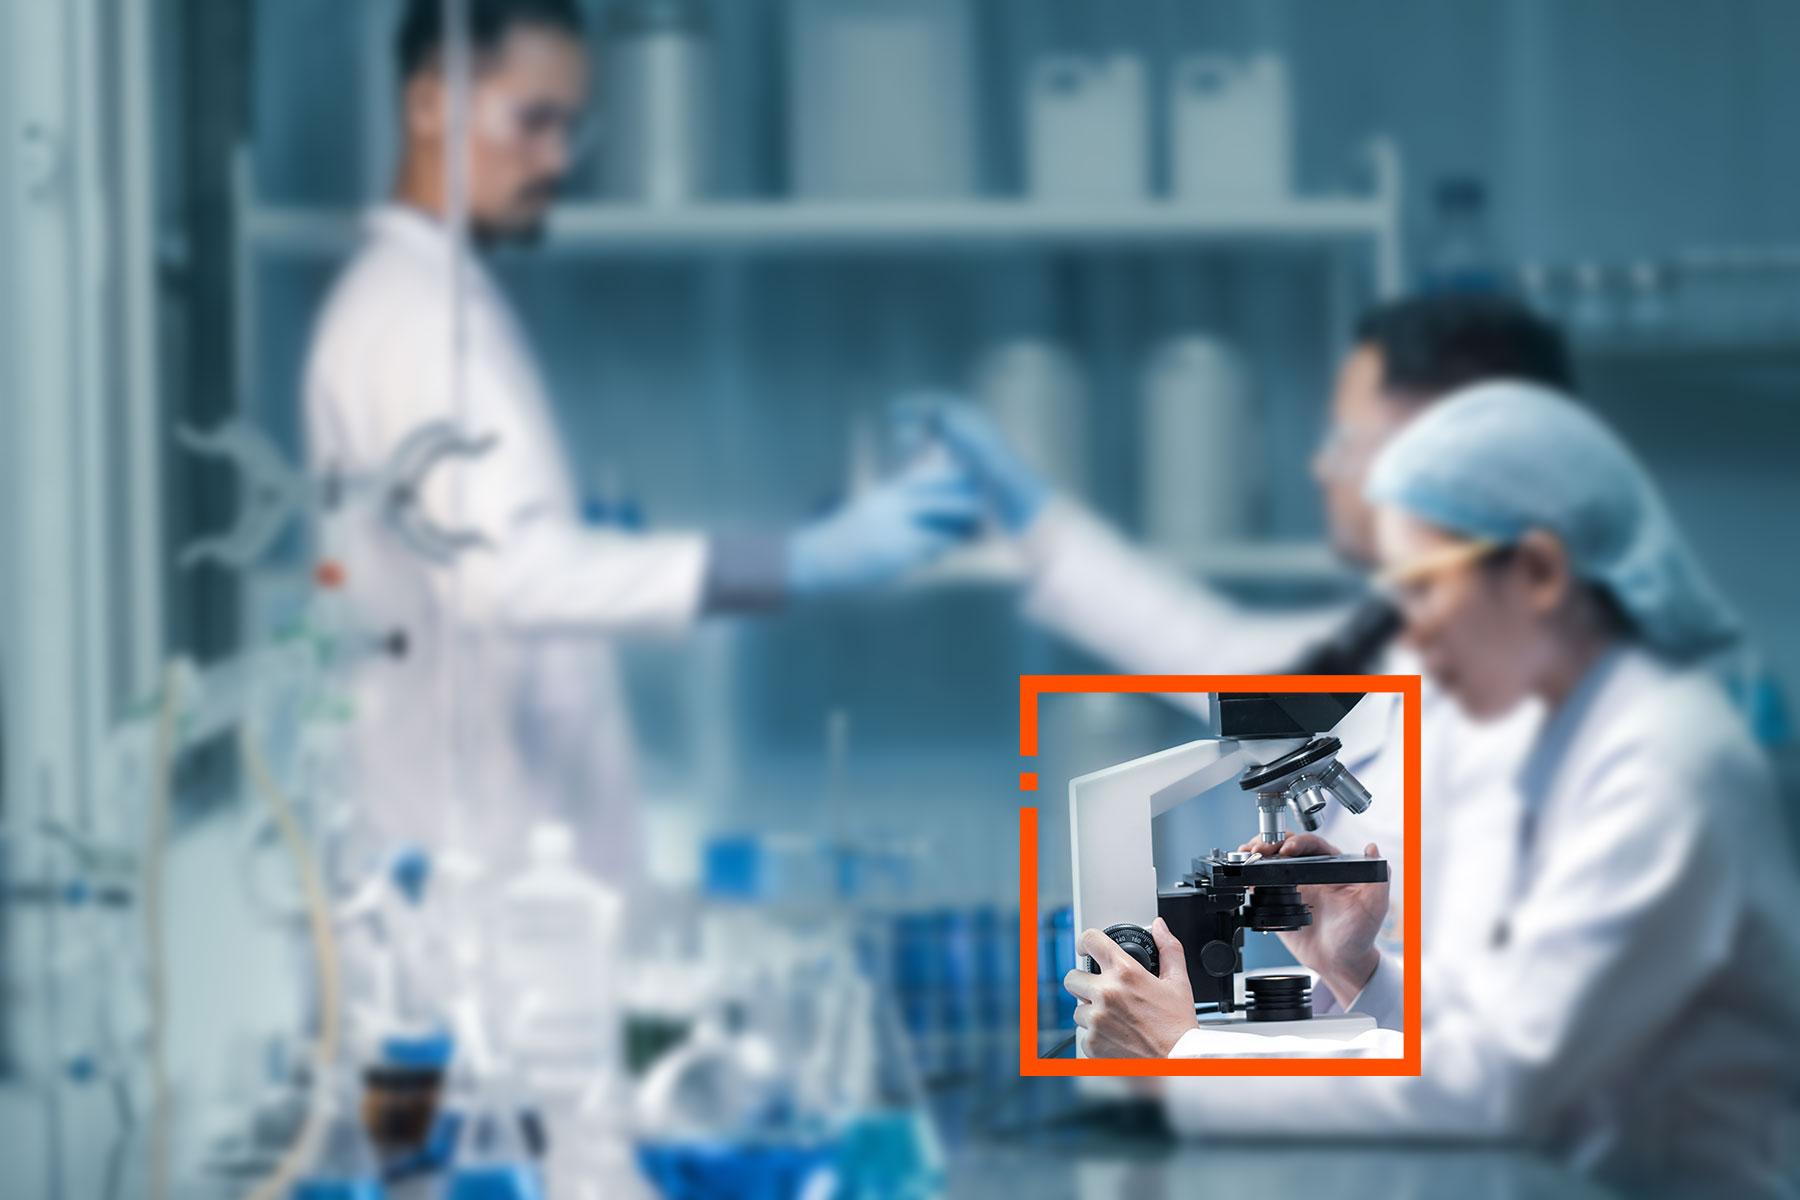 industry_life-sciences_shutterstock_1606816702